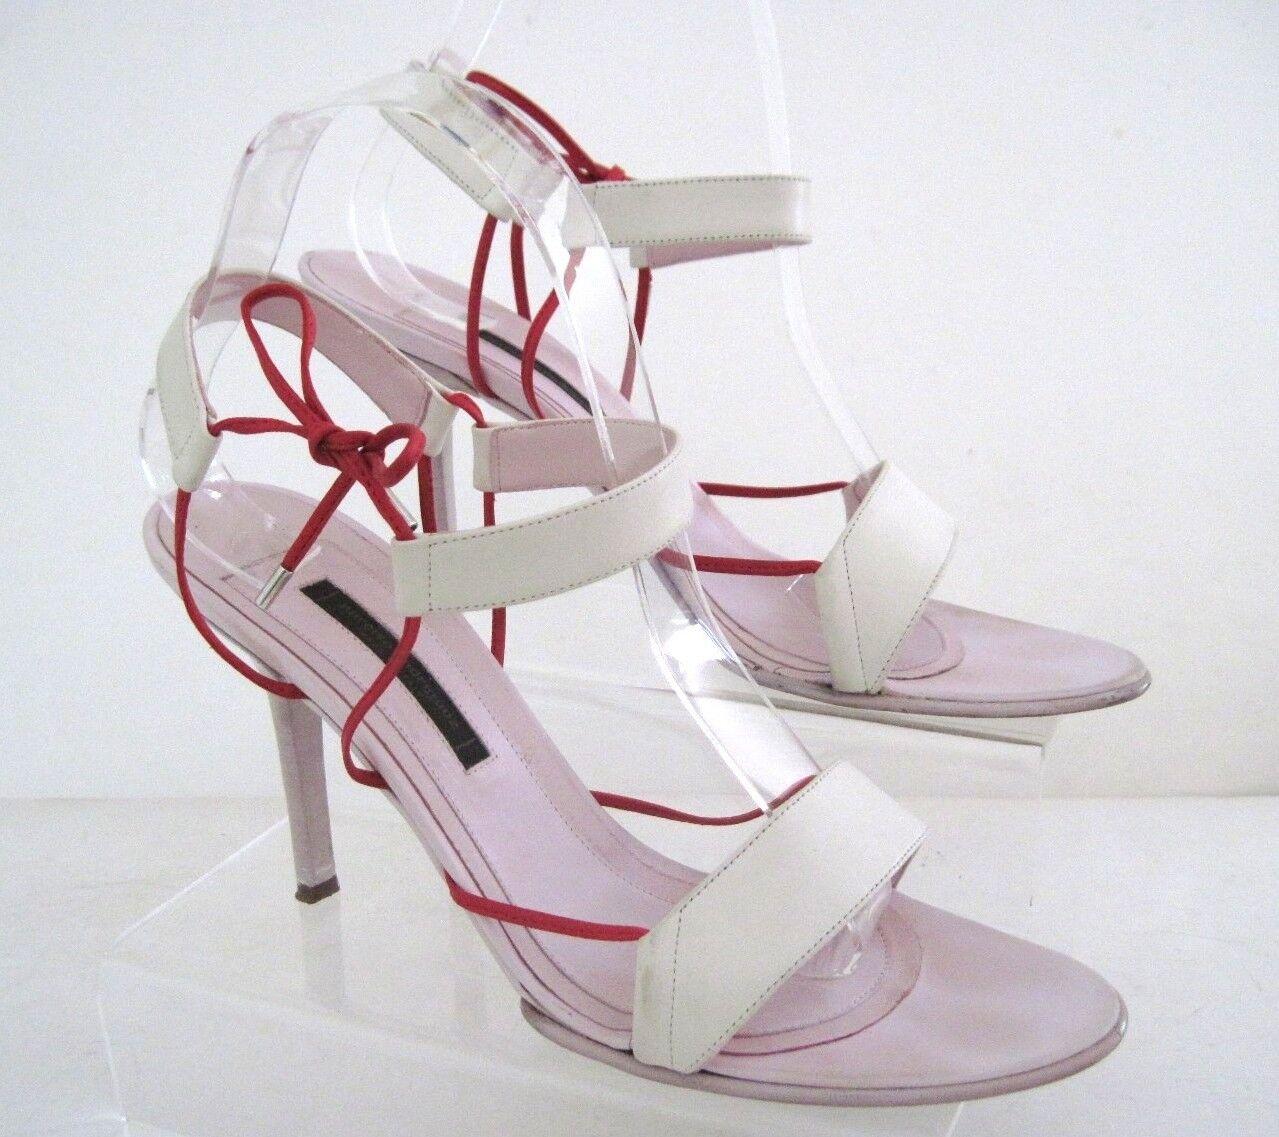 Narciso Rodriguez rosado Luz blancoa De Cuero Sandalias De Tiras Tiras Tiras Talla 38 1 2 Italia  conveniente